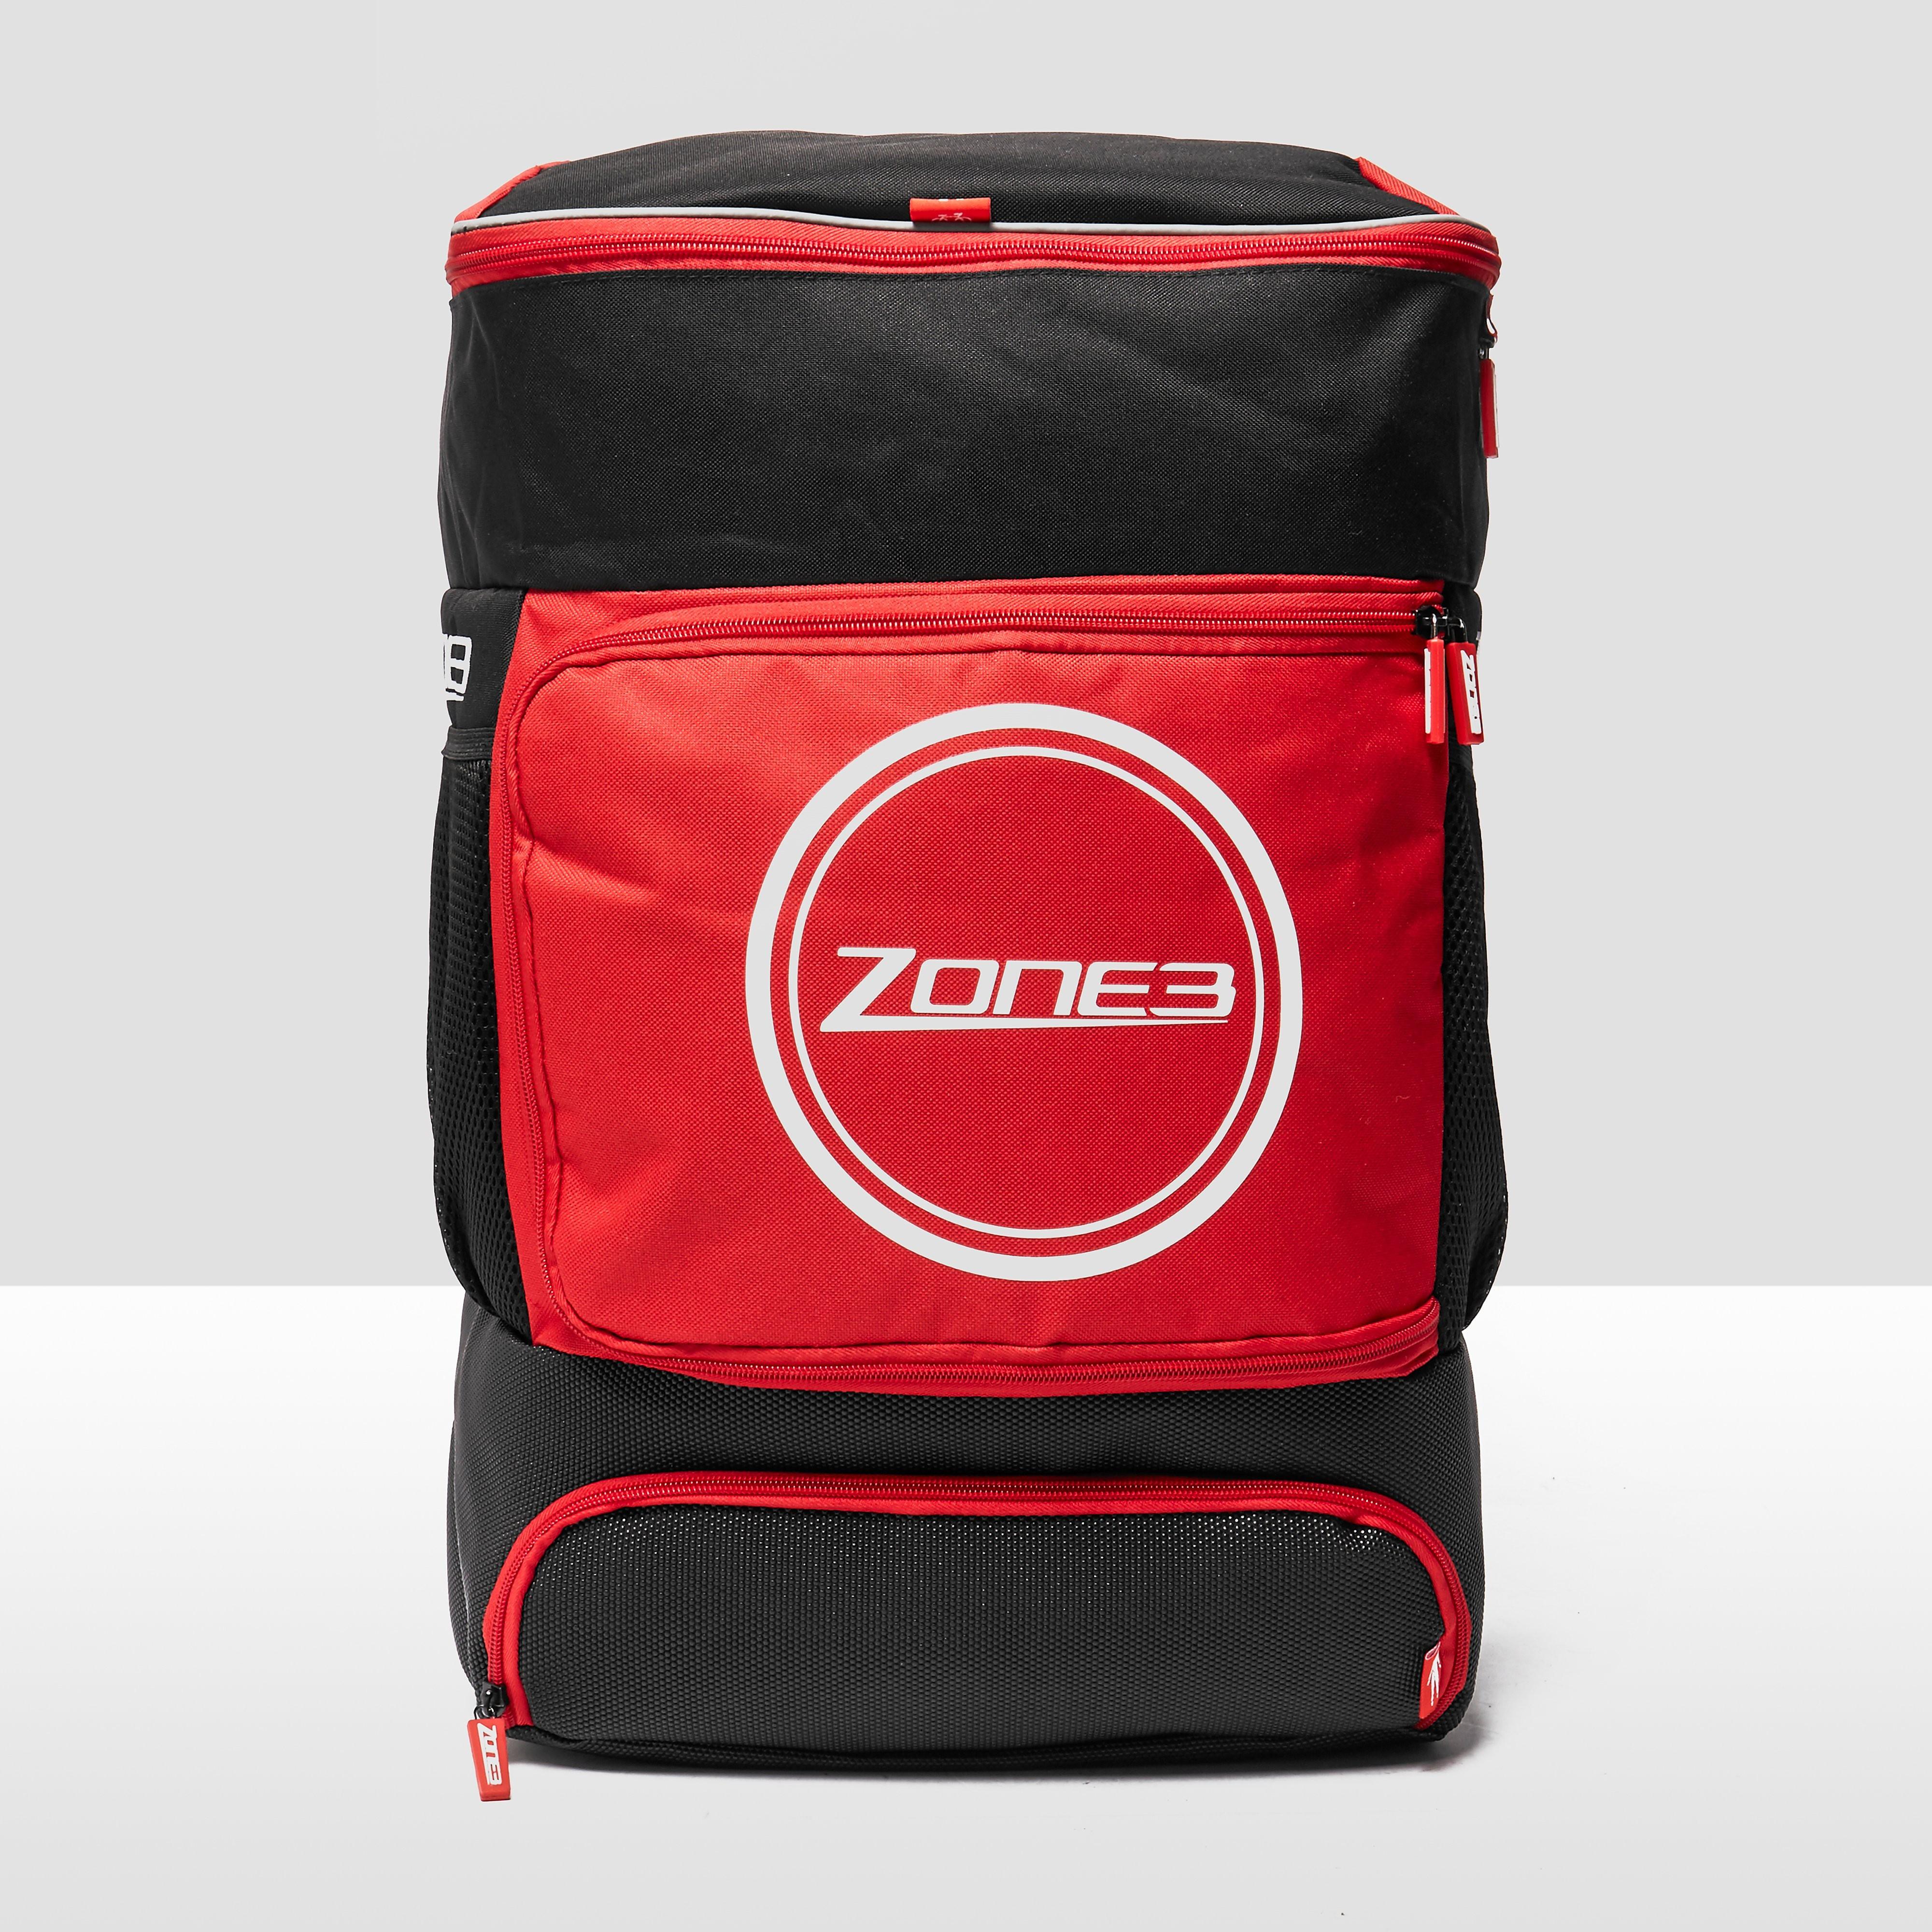 Zone 3 Transition Triathlon Backpack